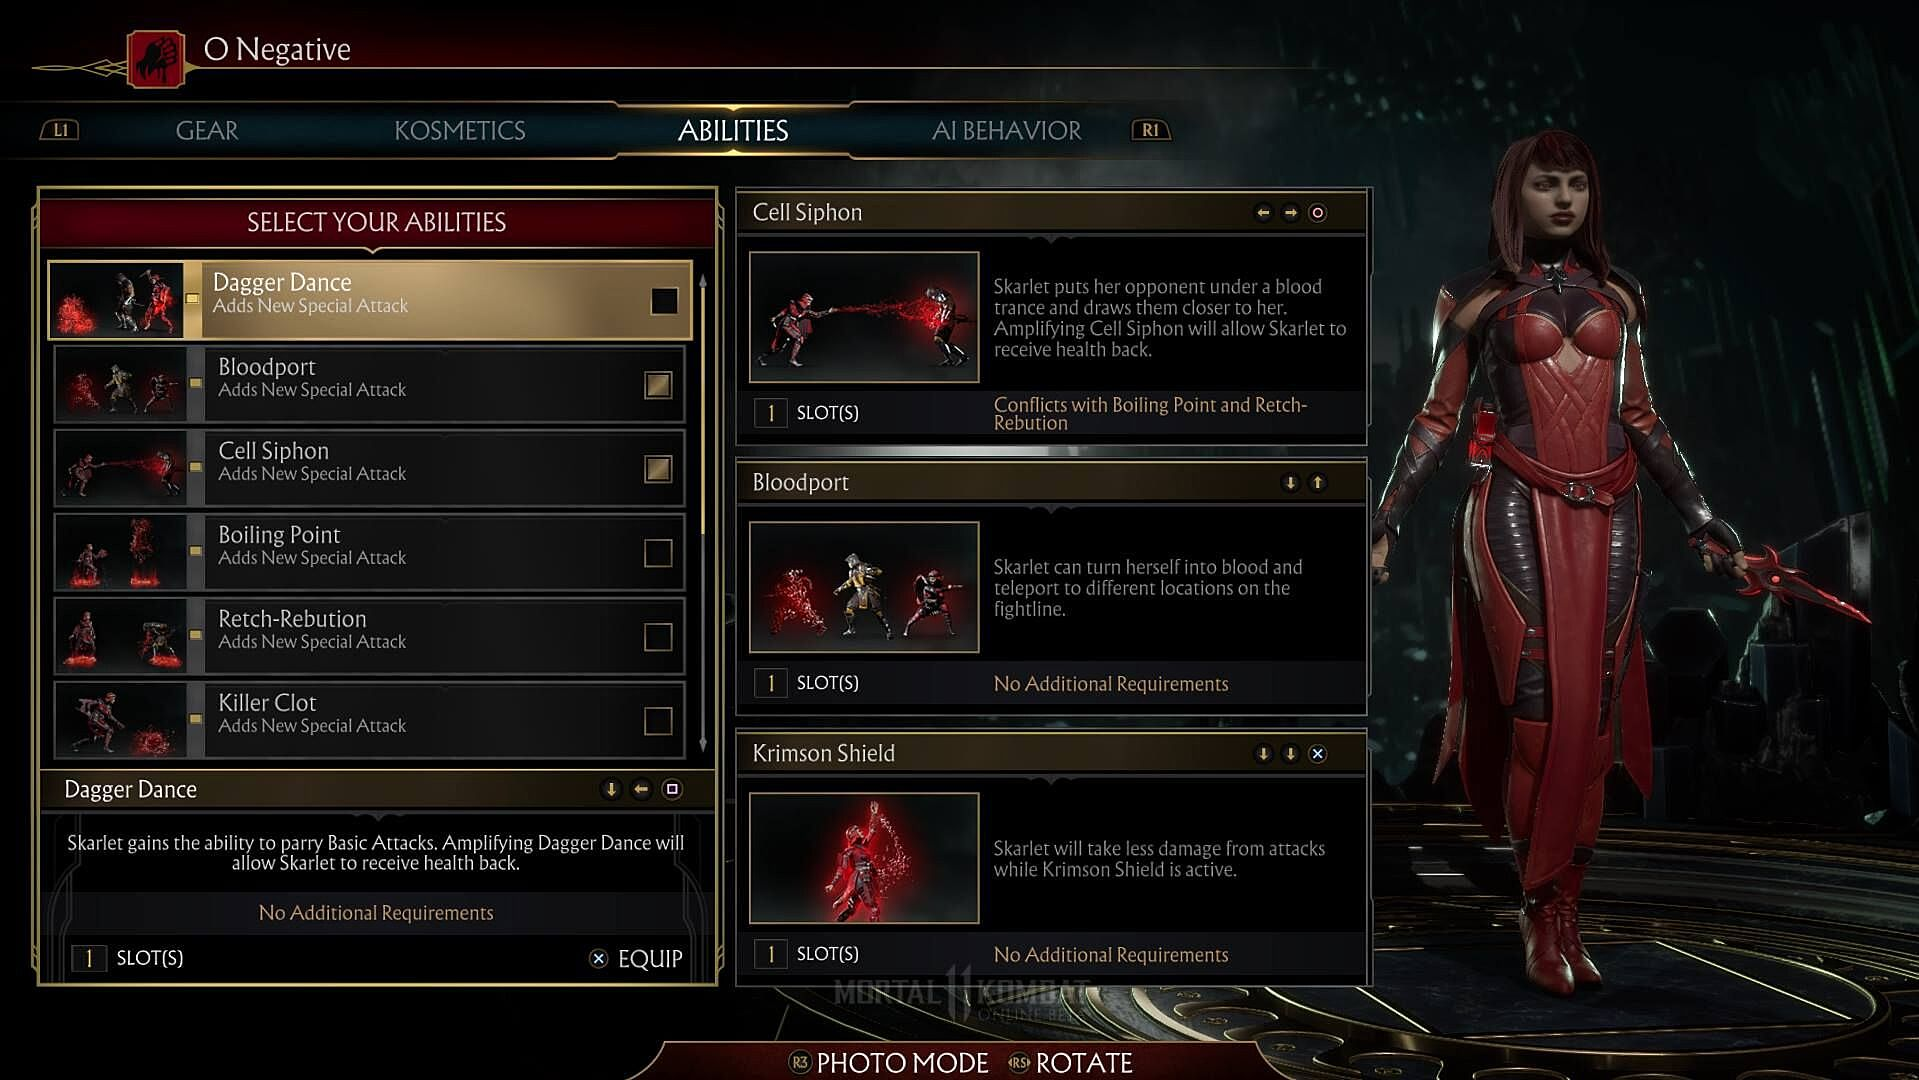 Mortal Kombat 11 online stress test: Lots of test, but